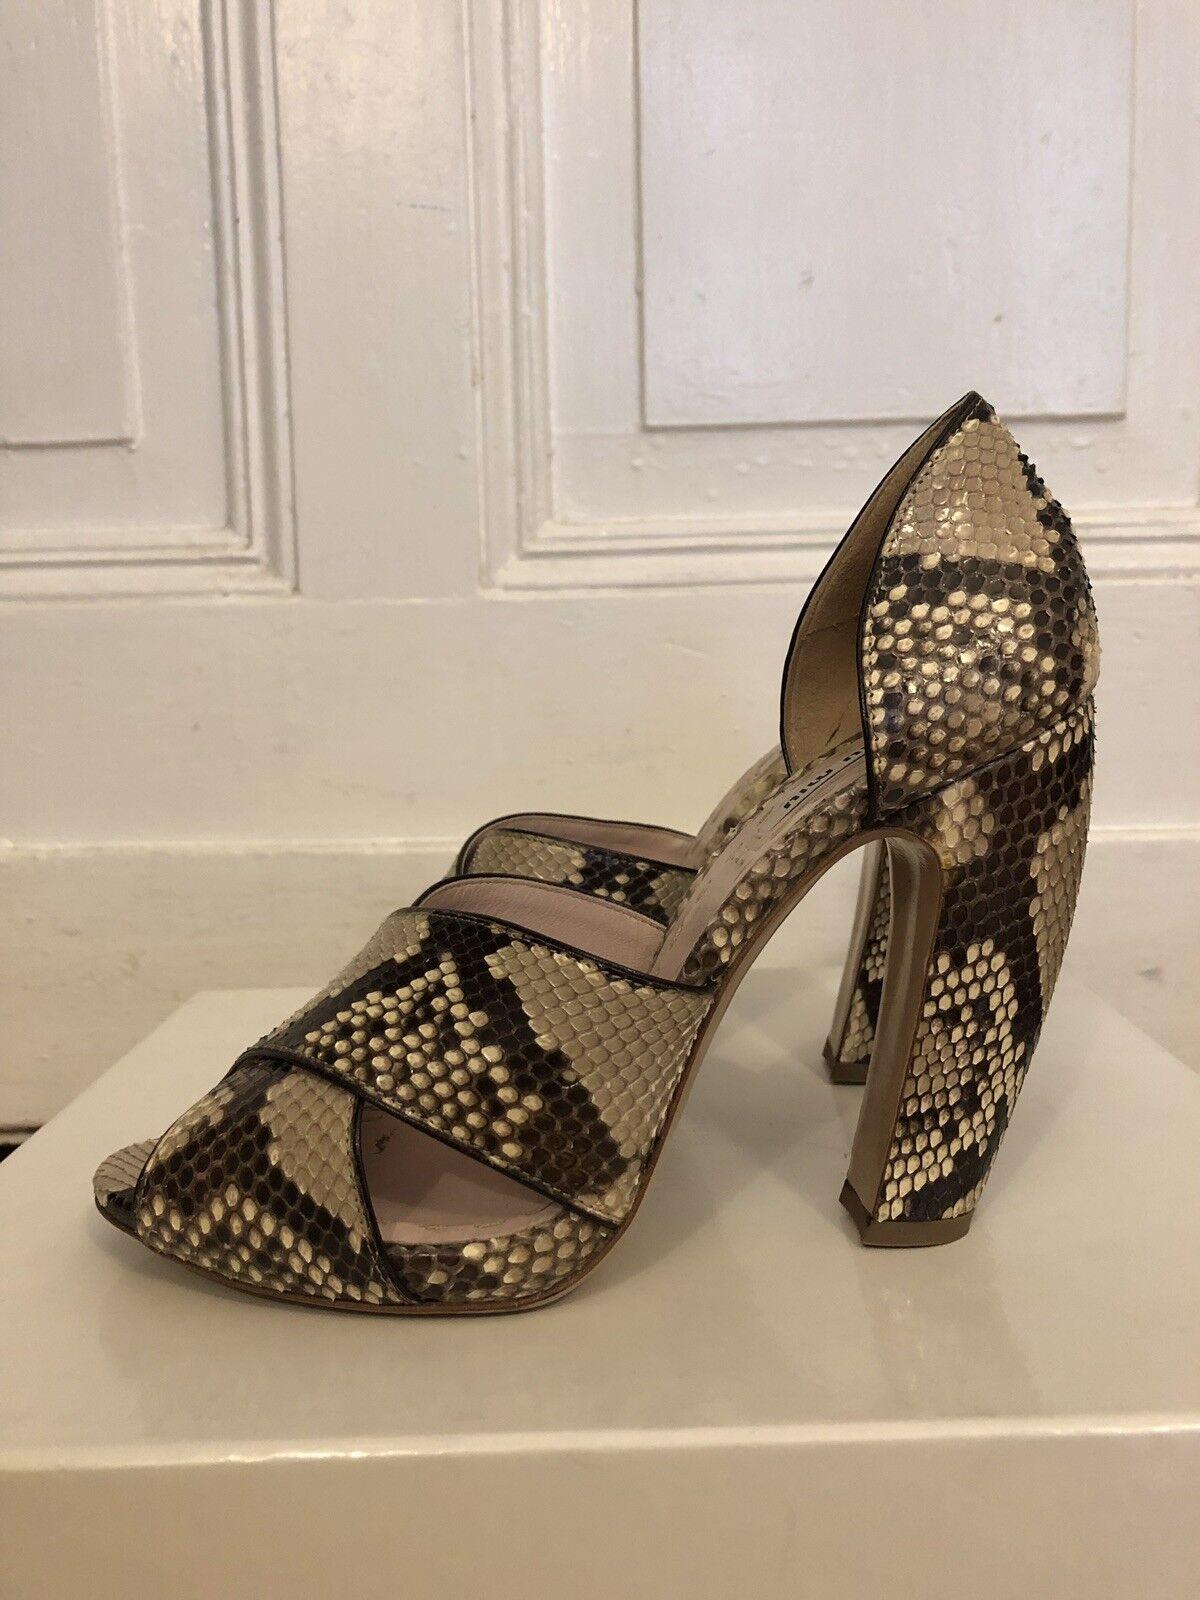 Miu Miu Miu Miu Sandalen aus Leder, Schlange in beige und brown, Größe 38,5 6da9cd